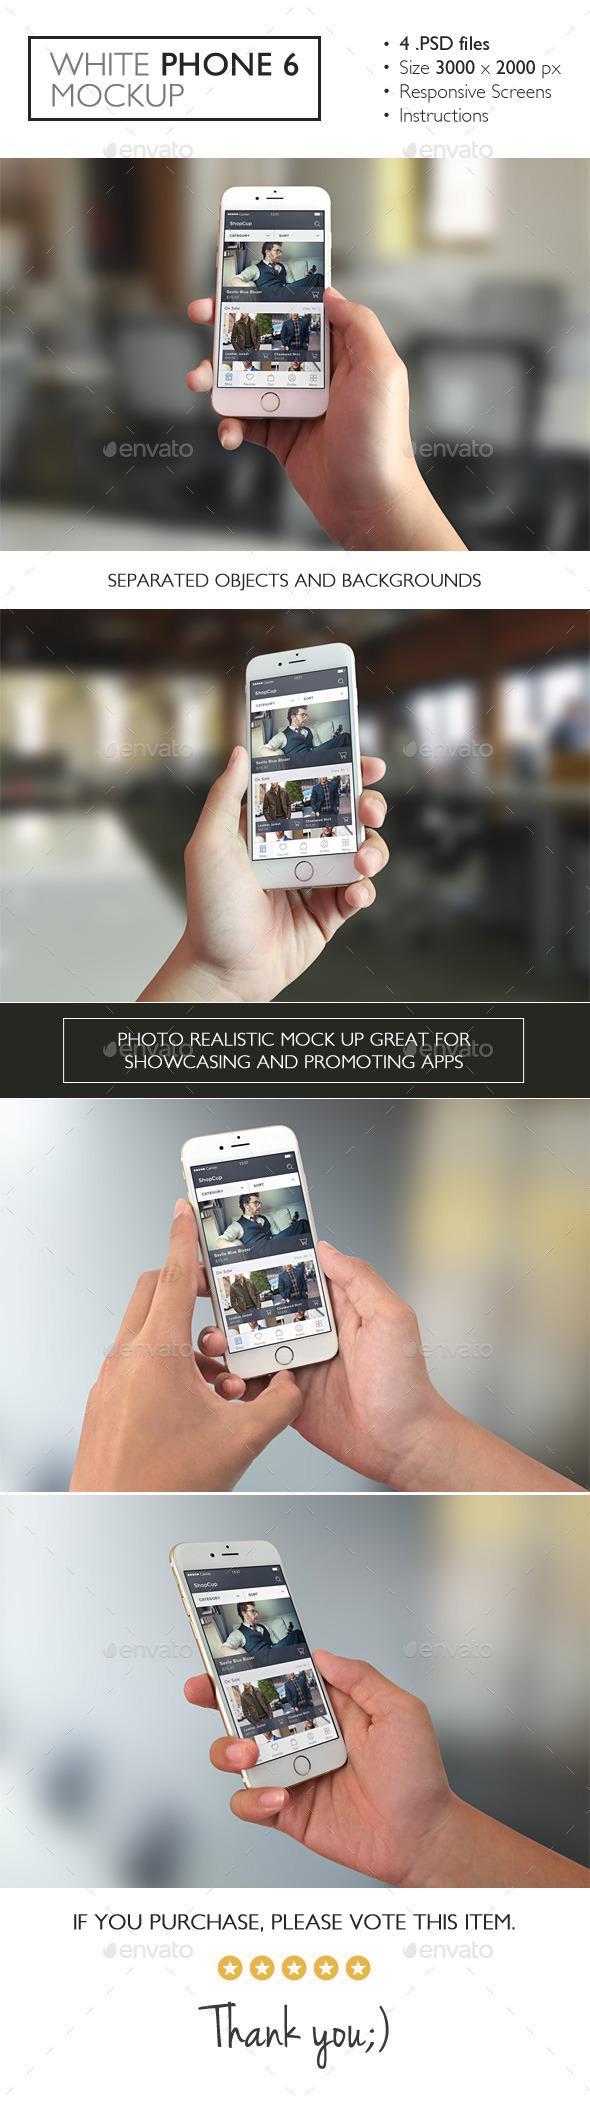 White Phone 6 Mockup